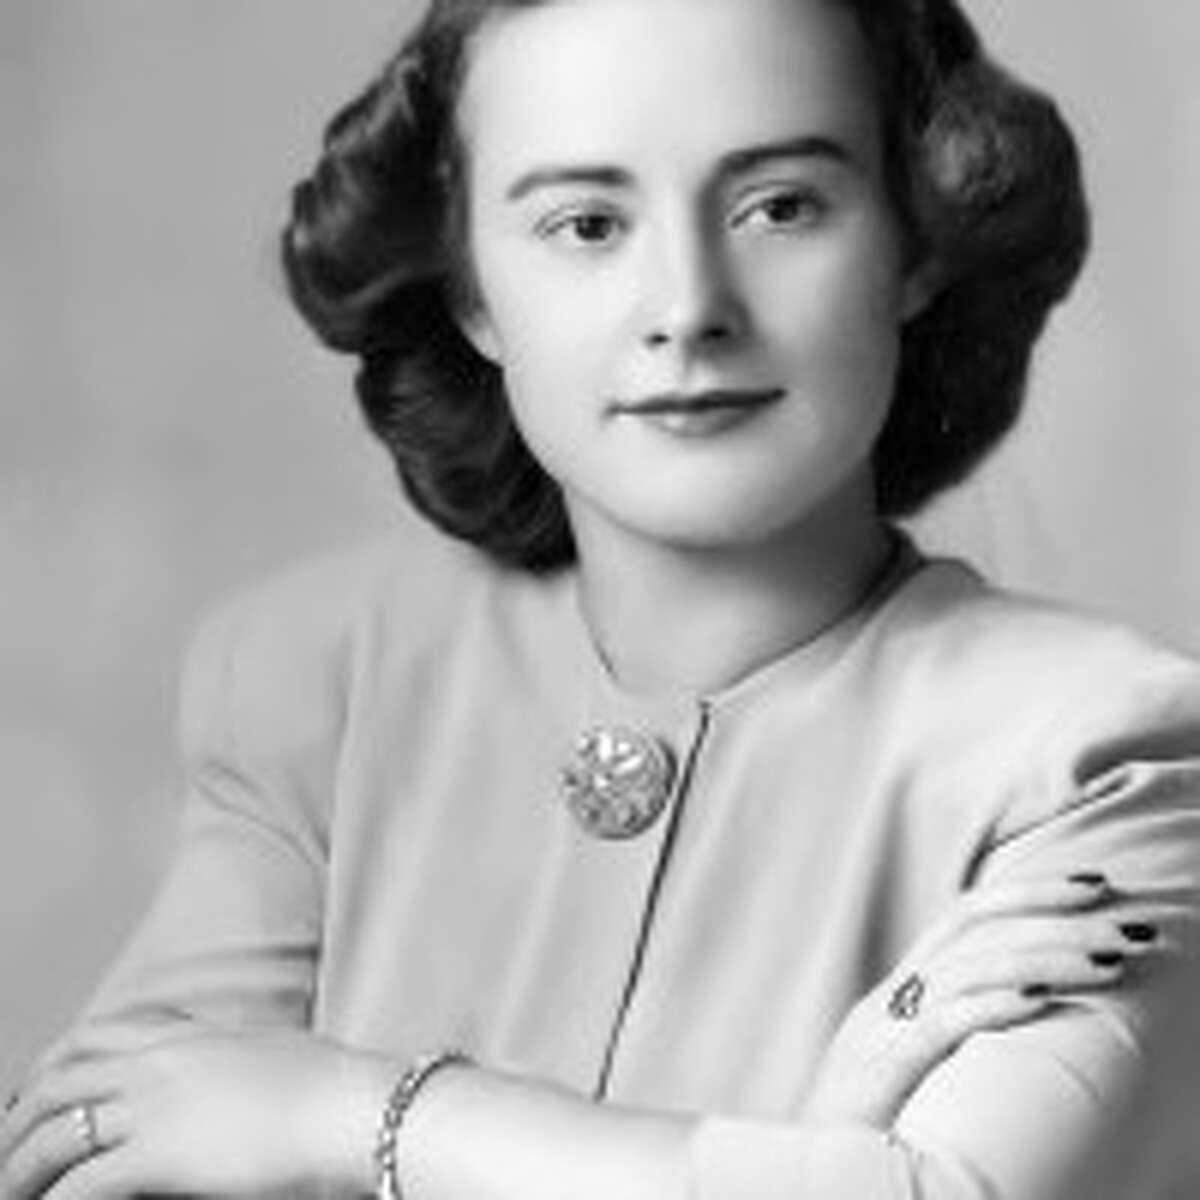 June E. Land